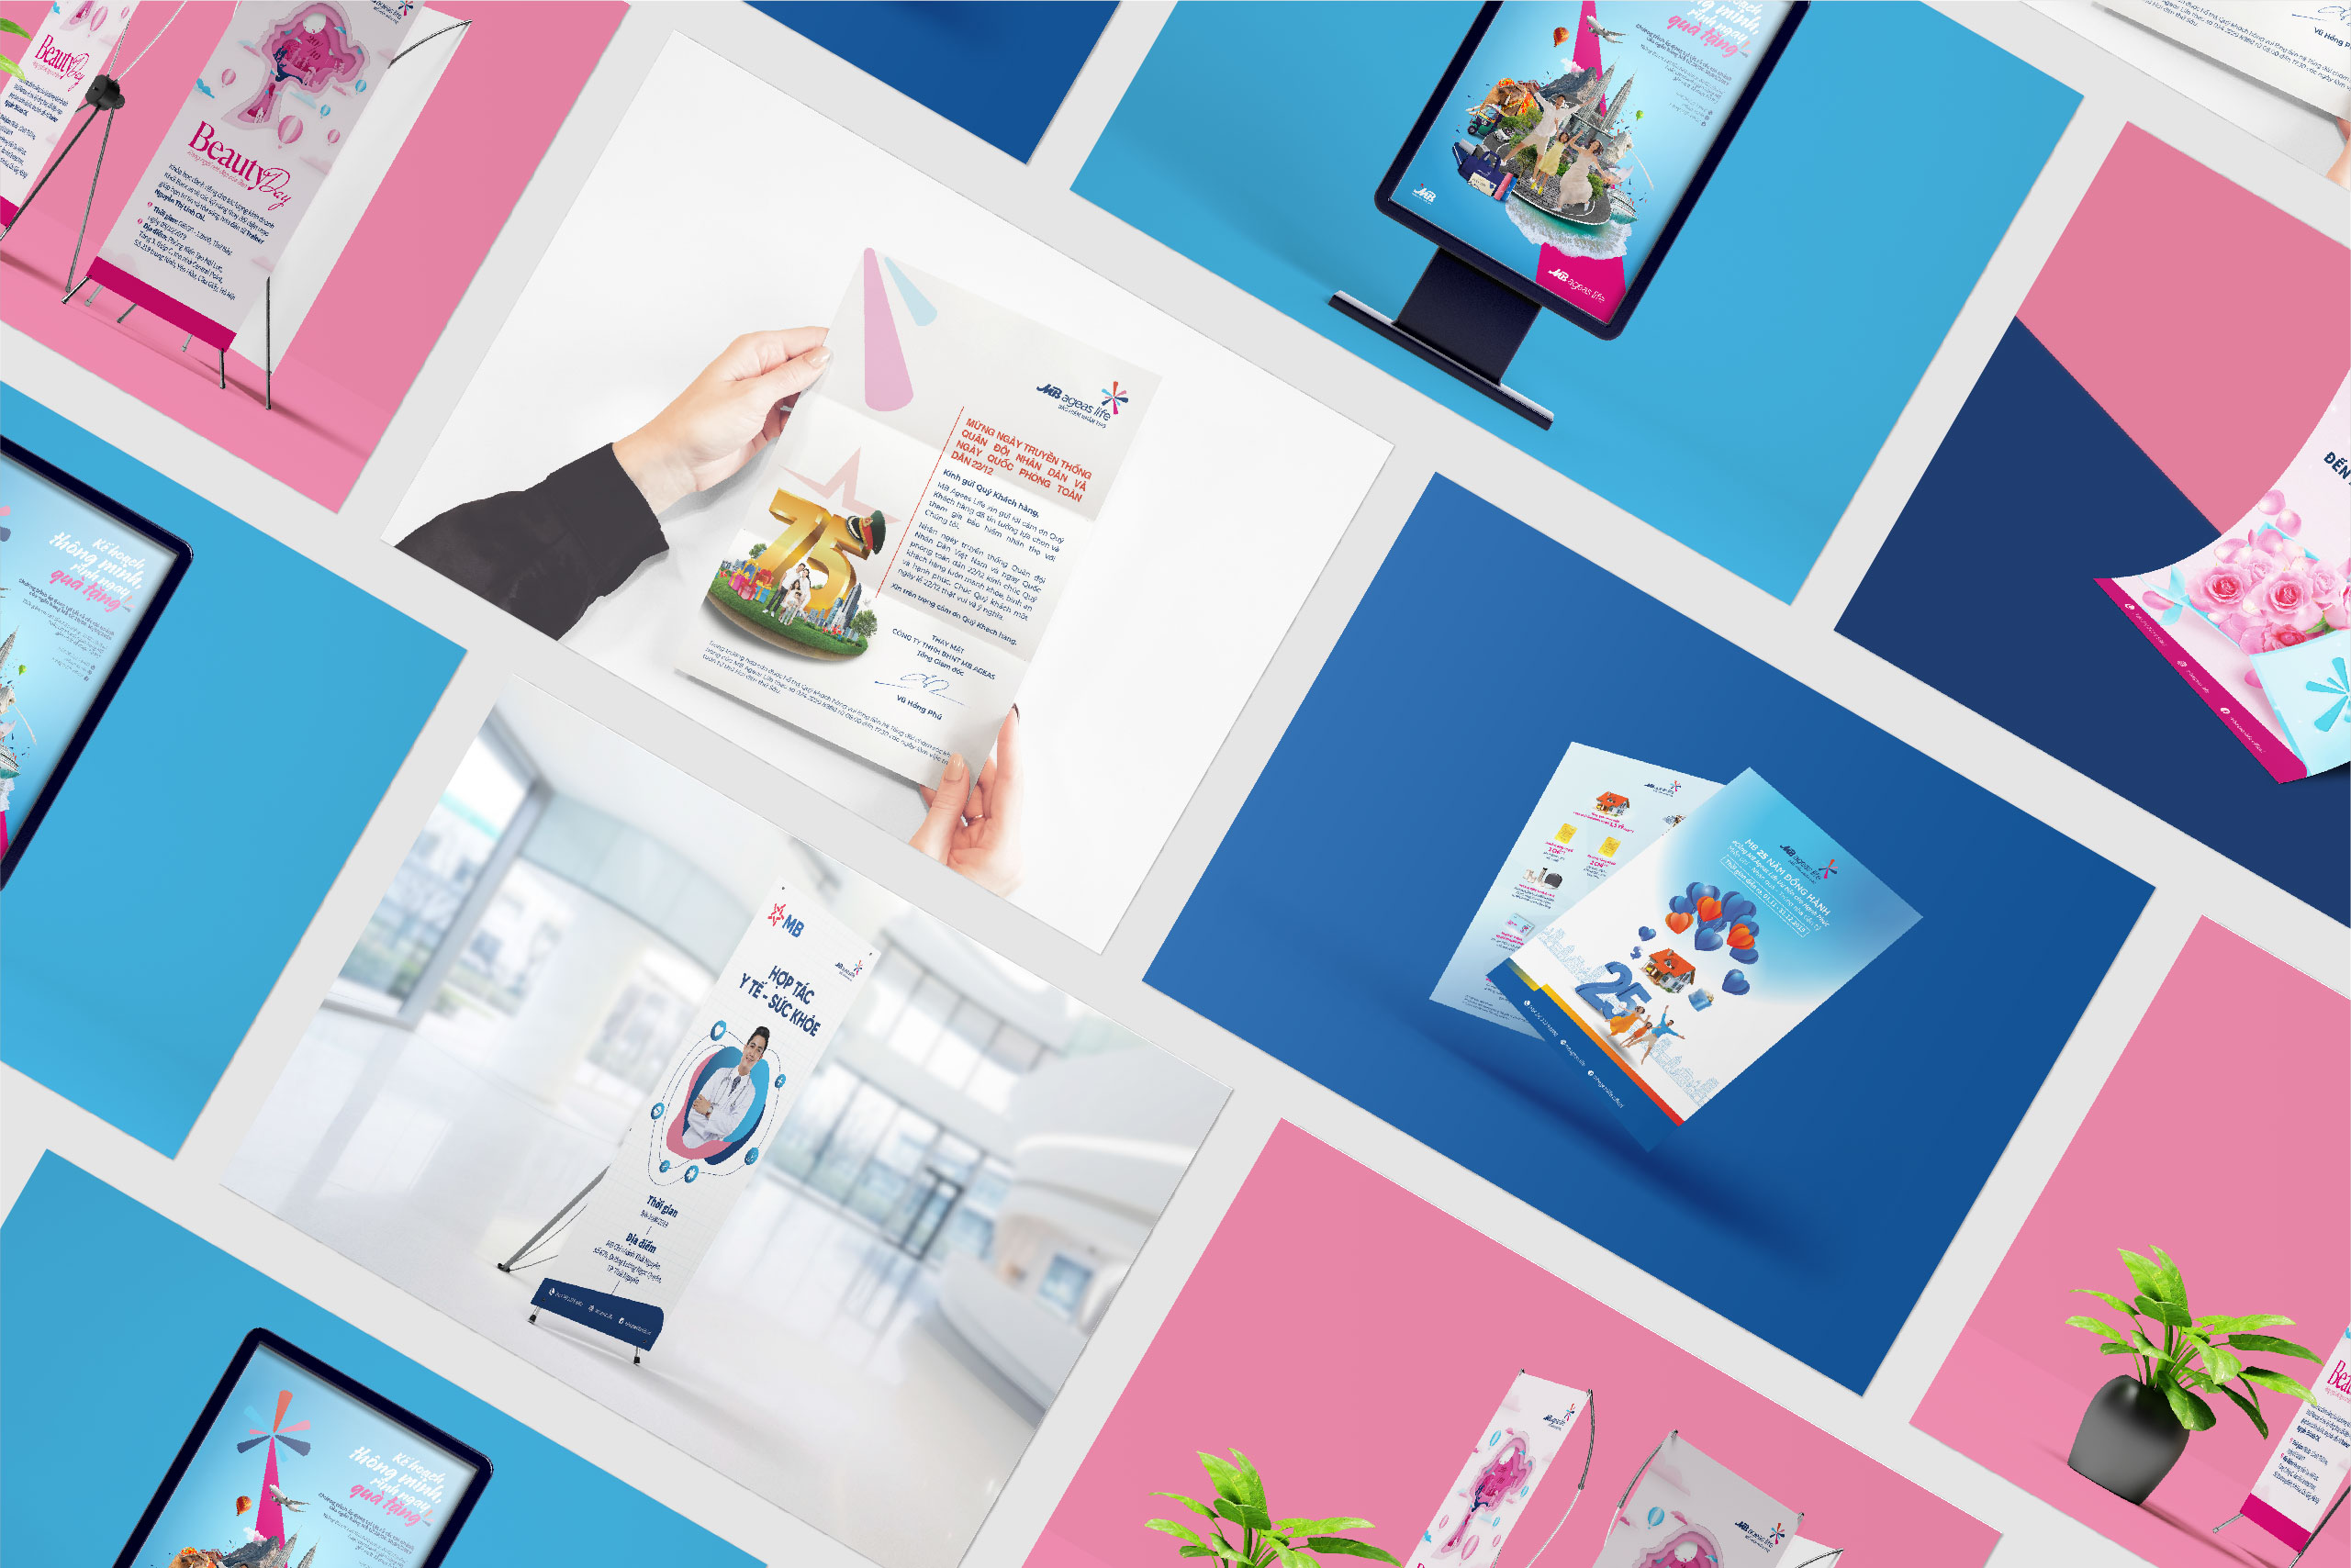 MBAL Communication Design 2019